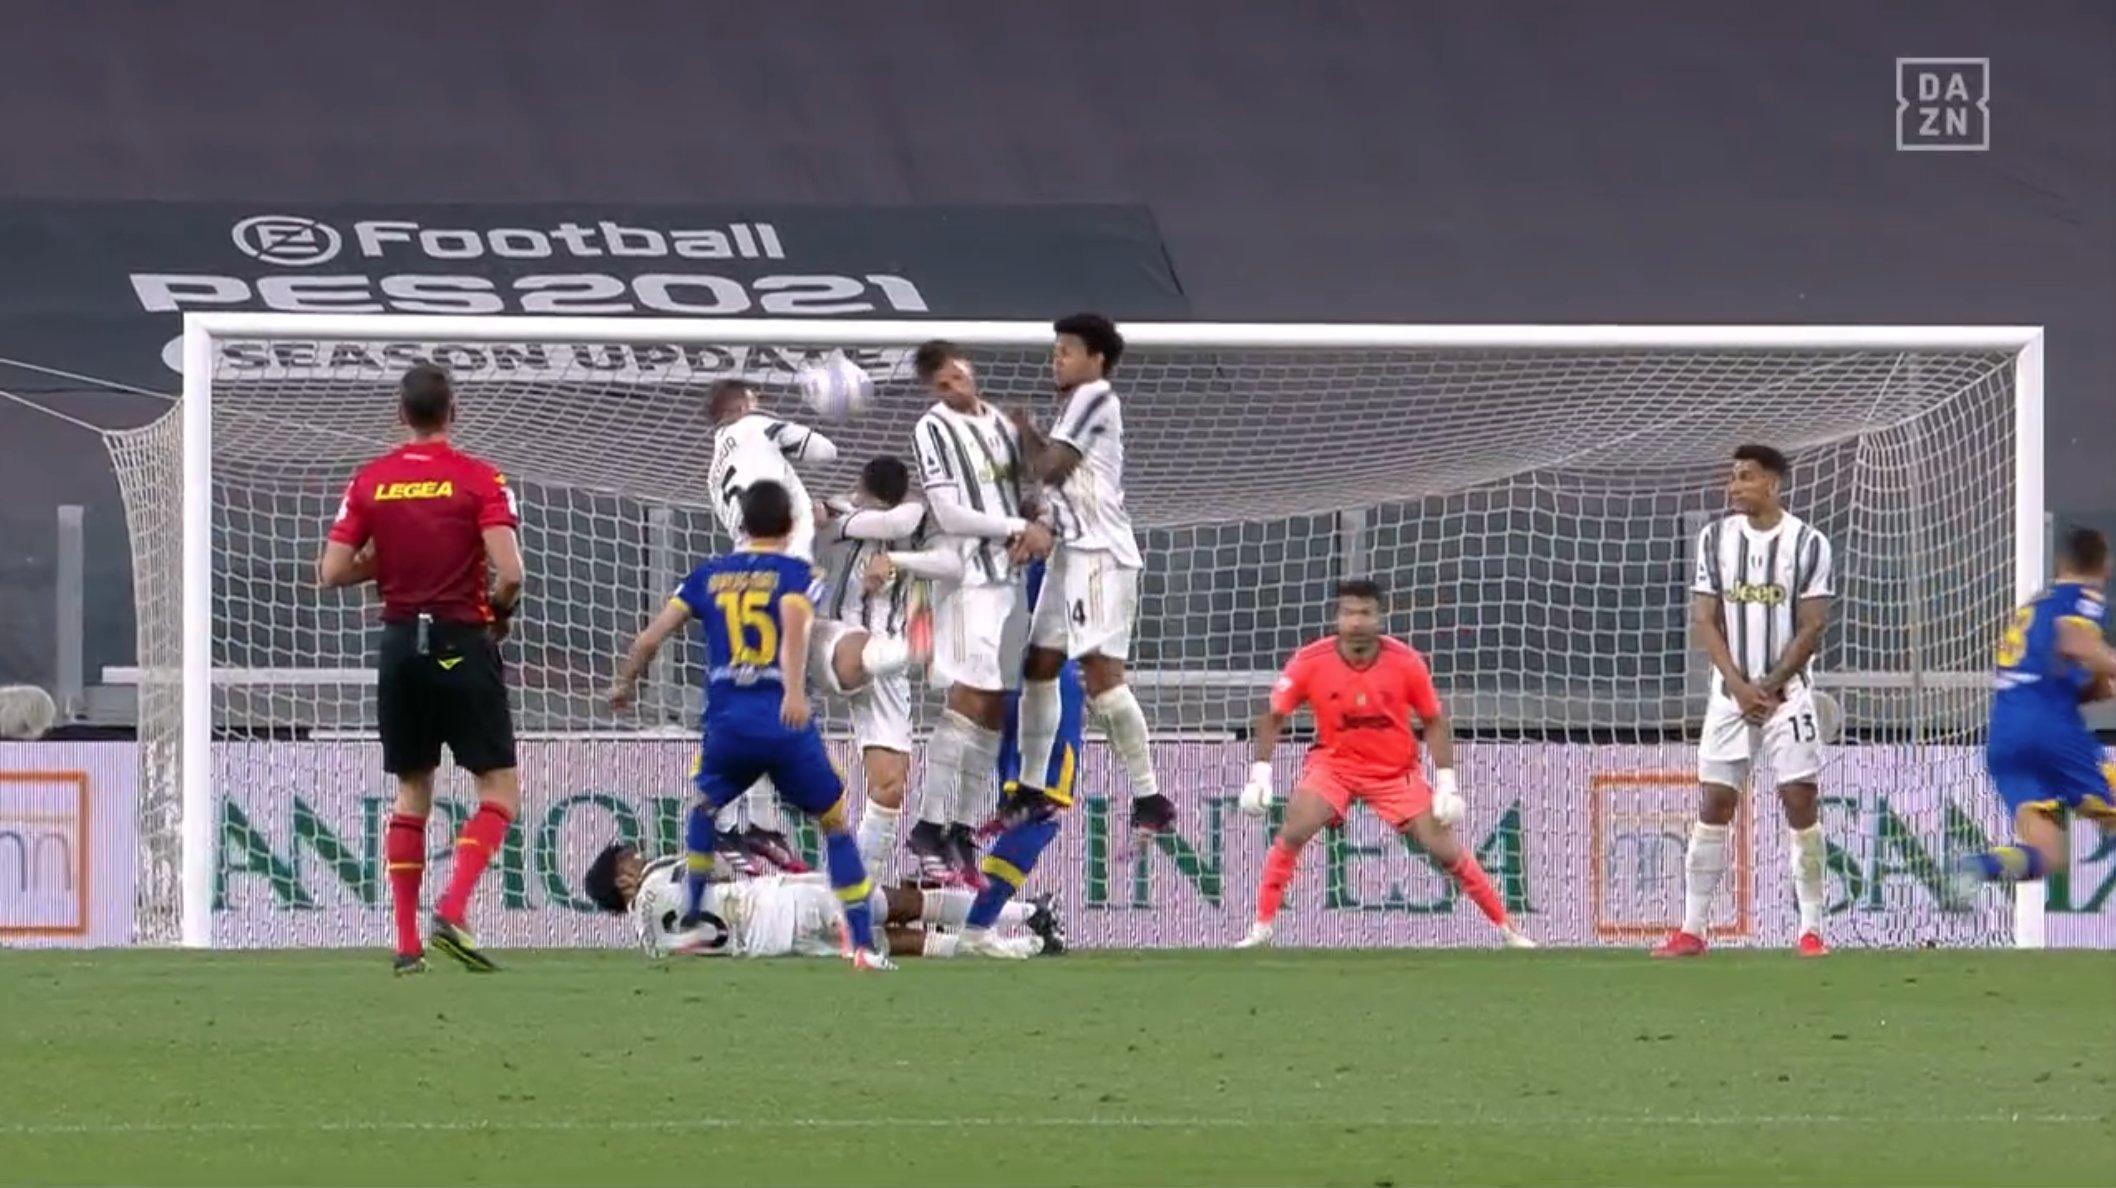 Ronaldo melakukan kesalahan saat membuat penghalang dari tendangan bebas